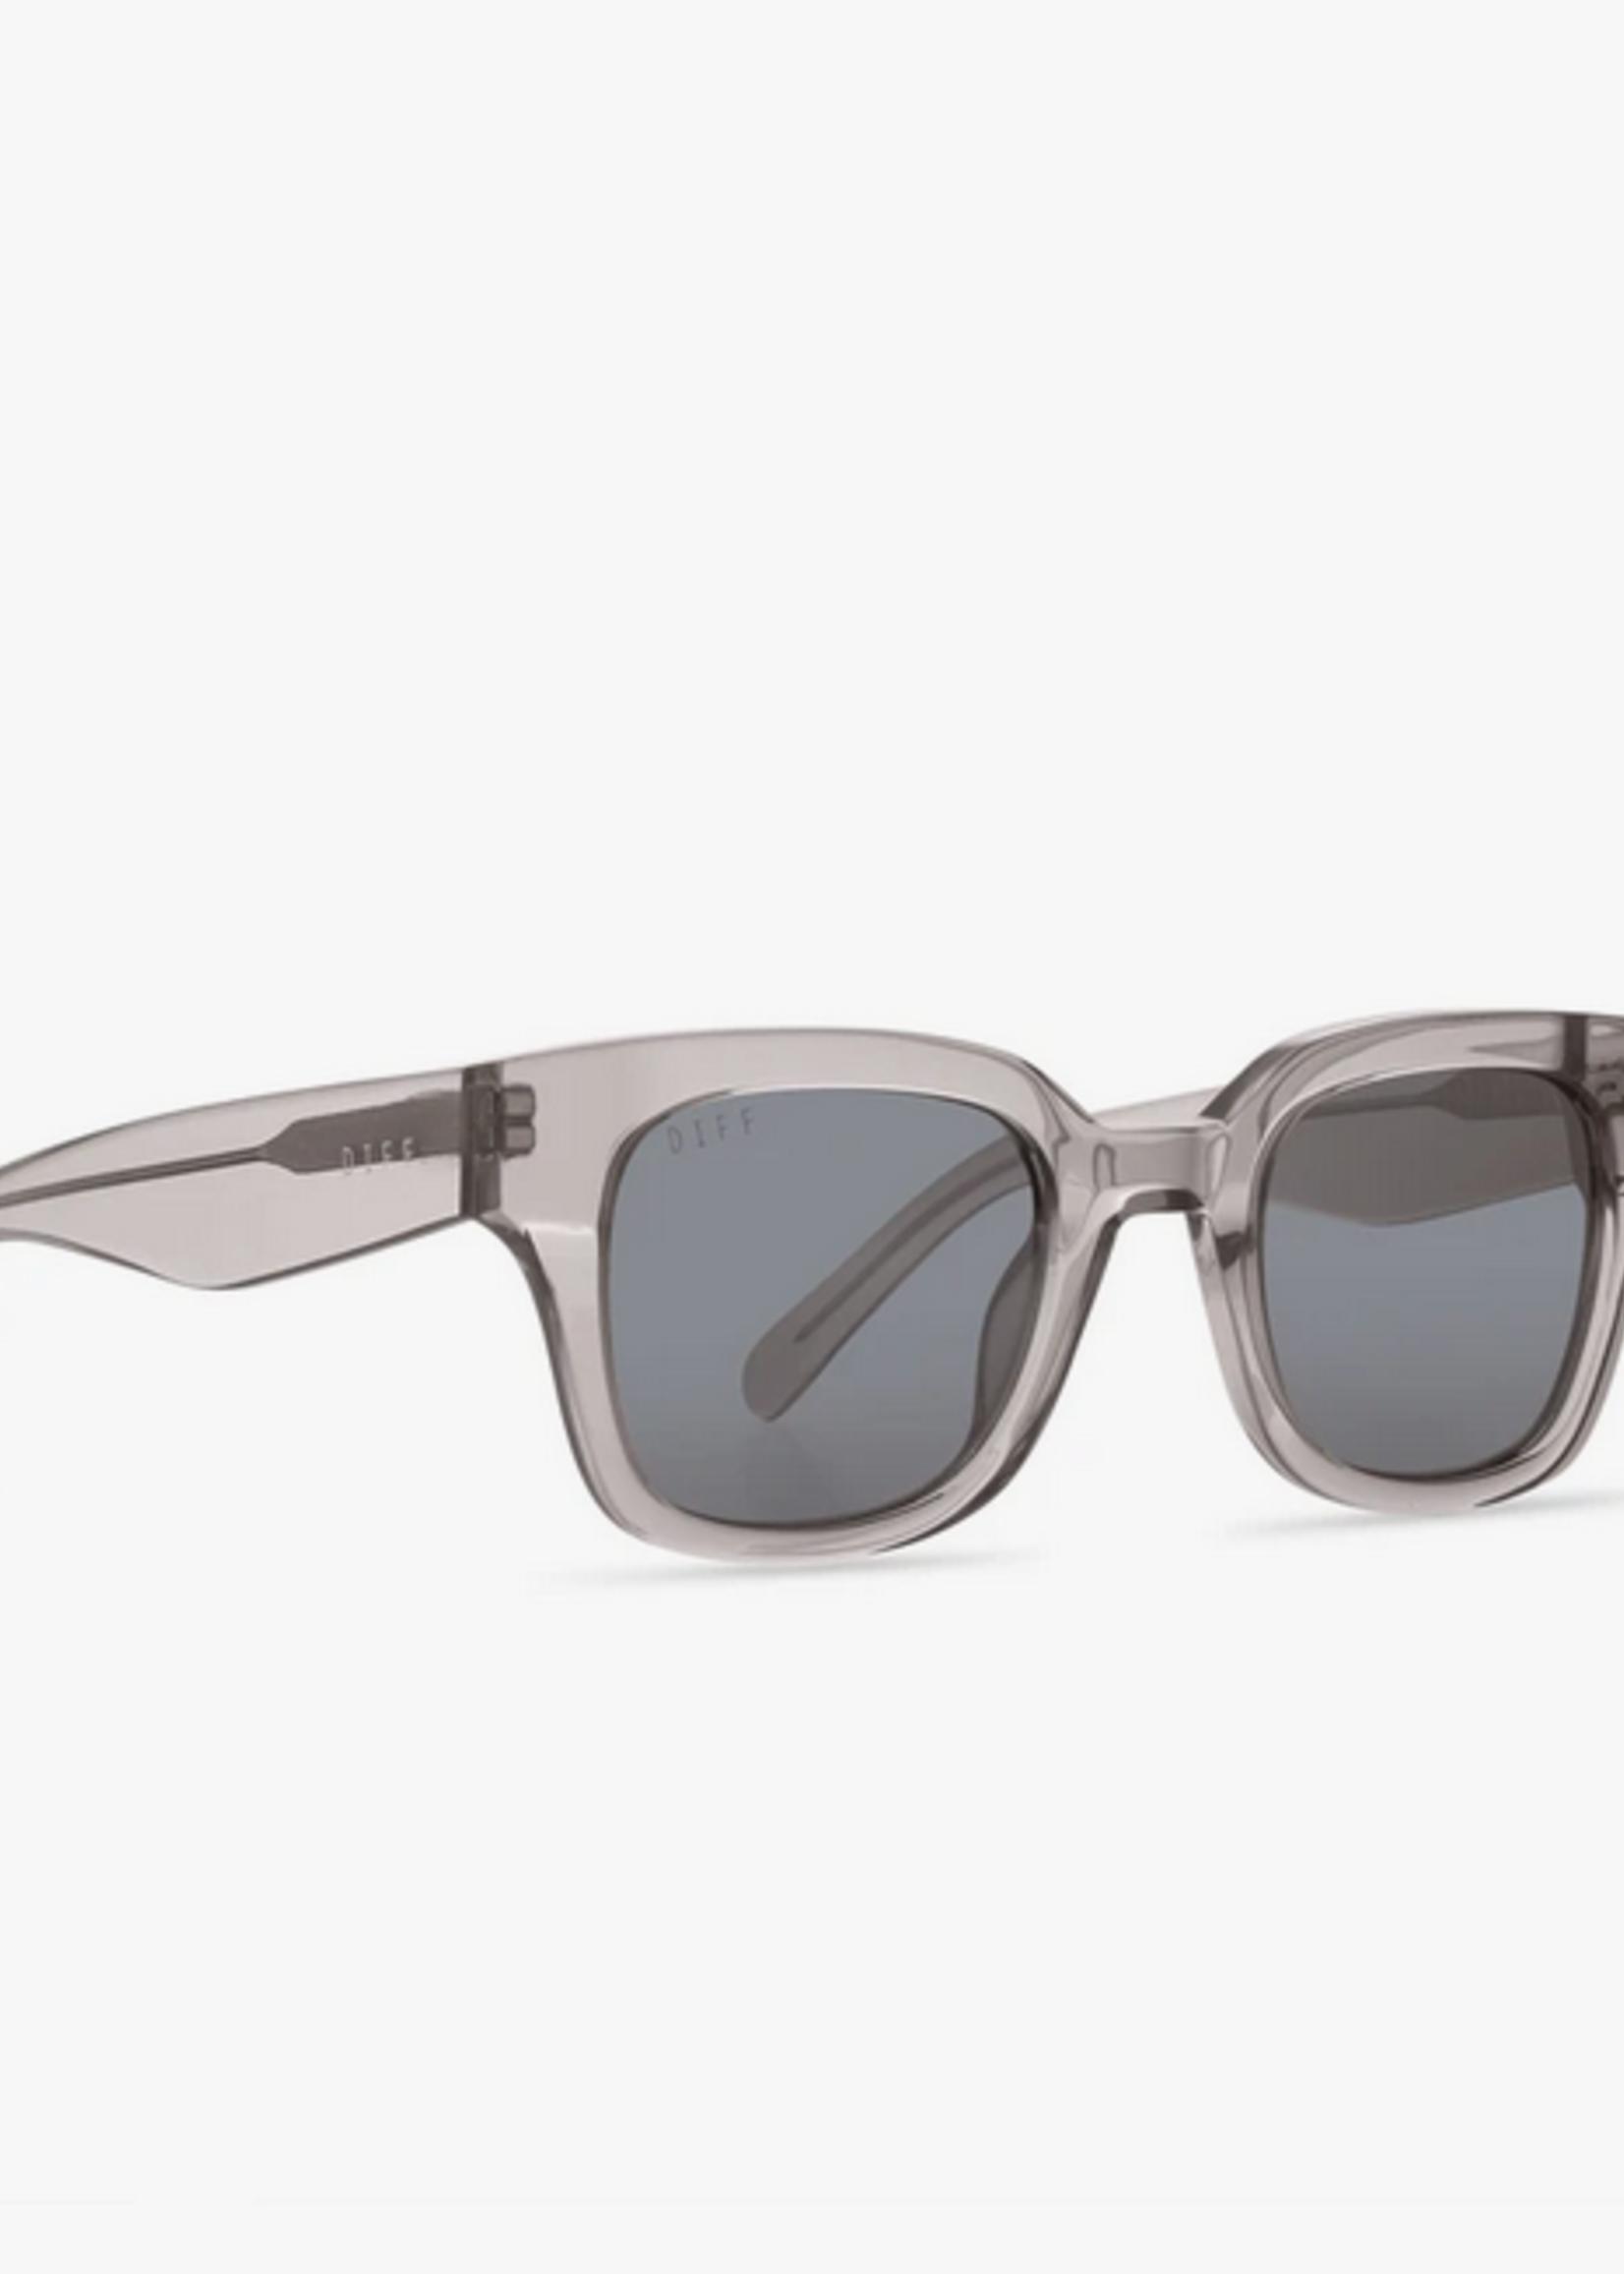 Elitaire Boutique Jean Template Grey Crystal Polaraized Sunglassses